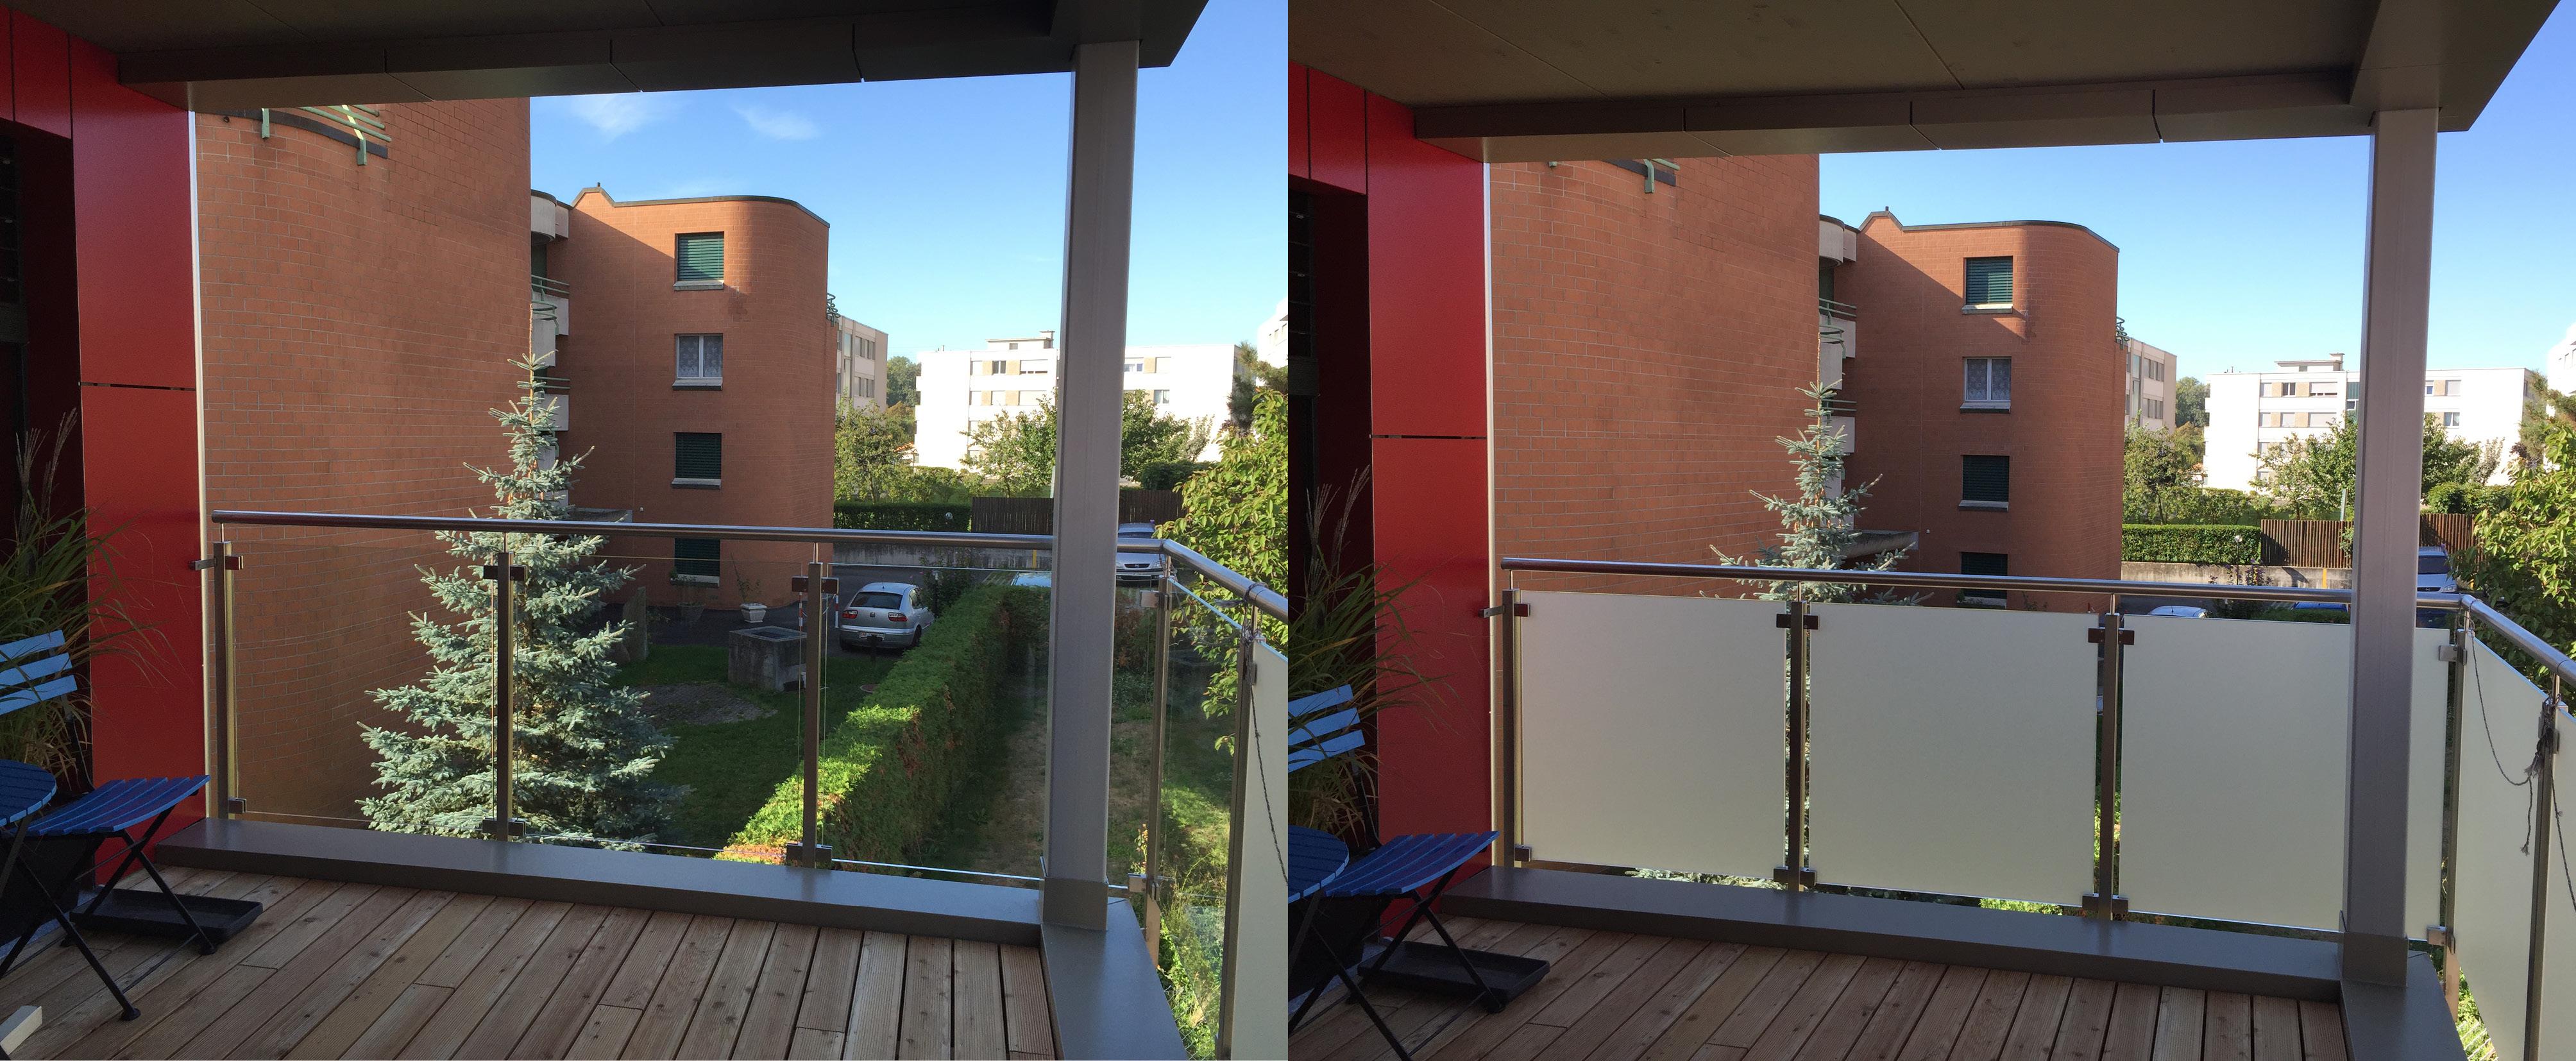 Film opaque discrétion sur balcon